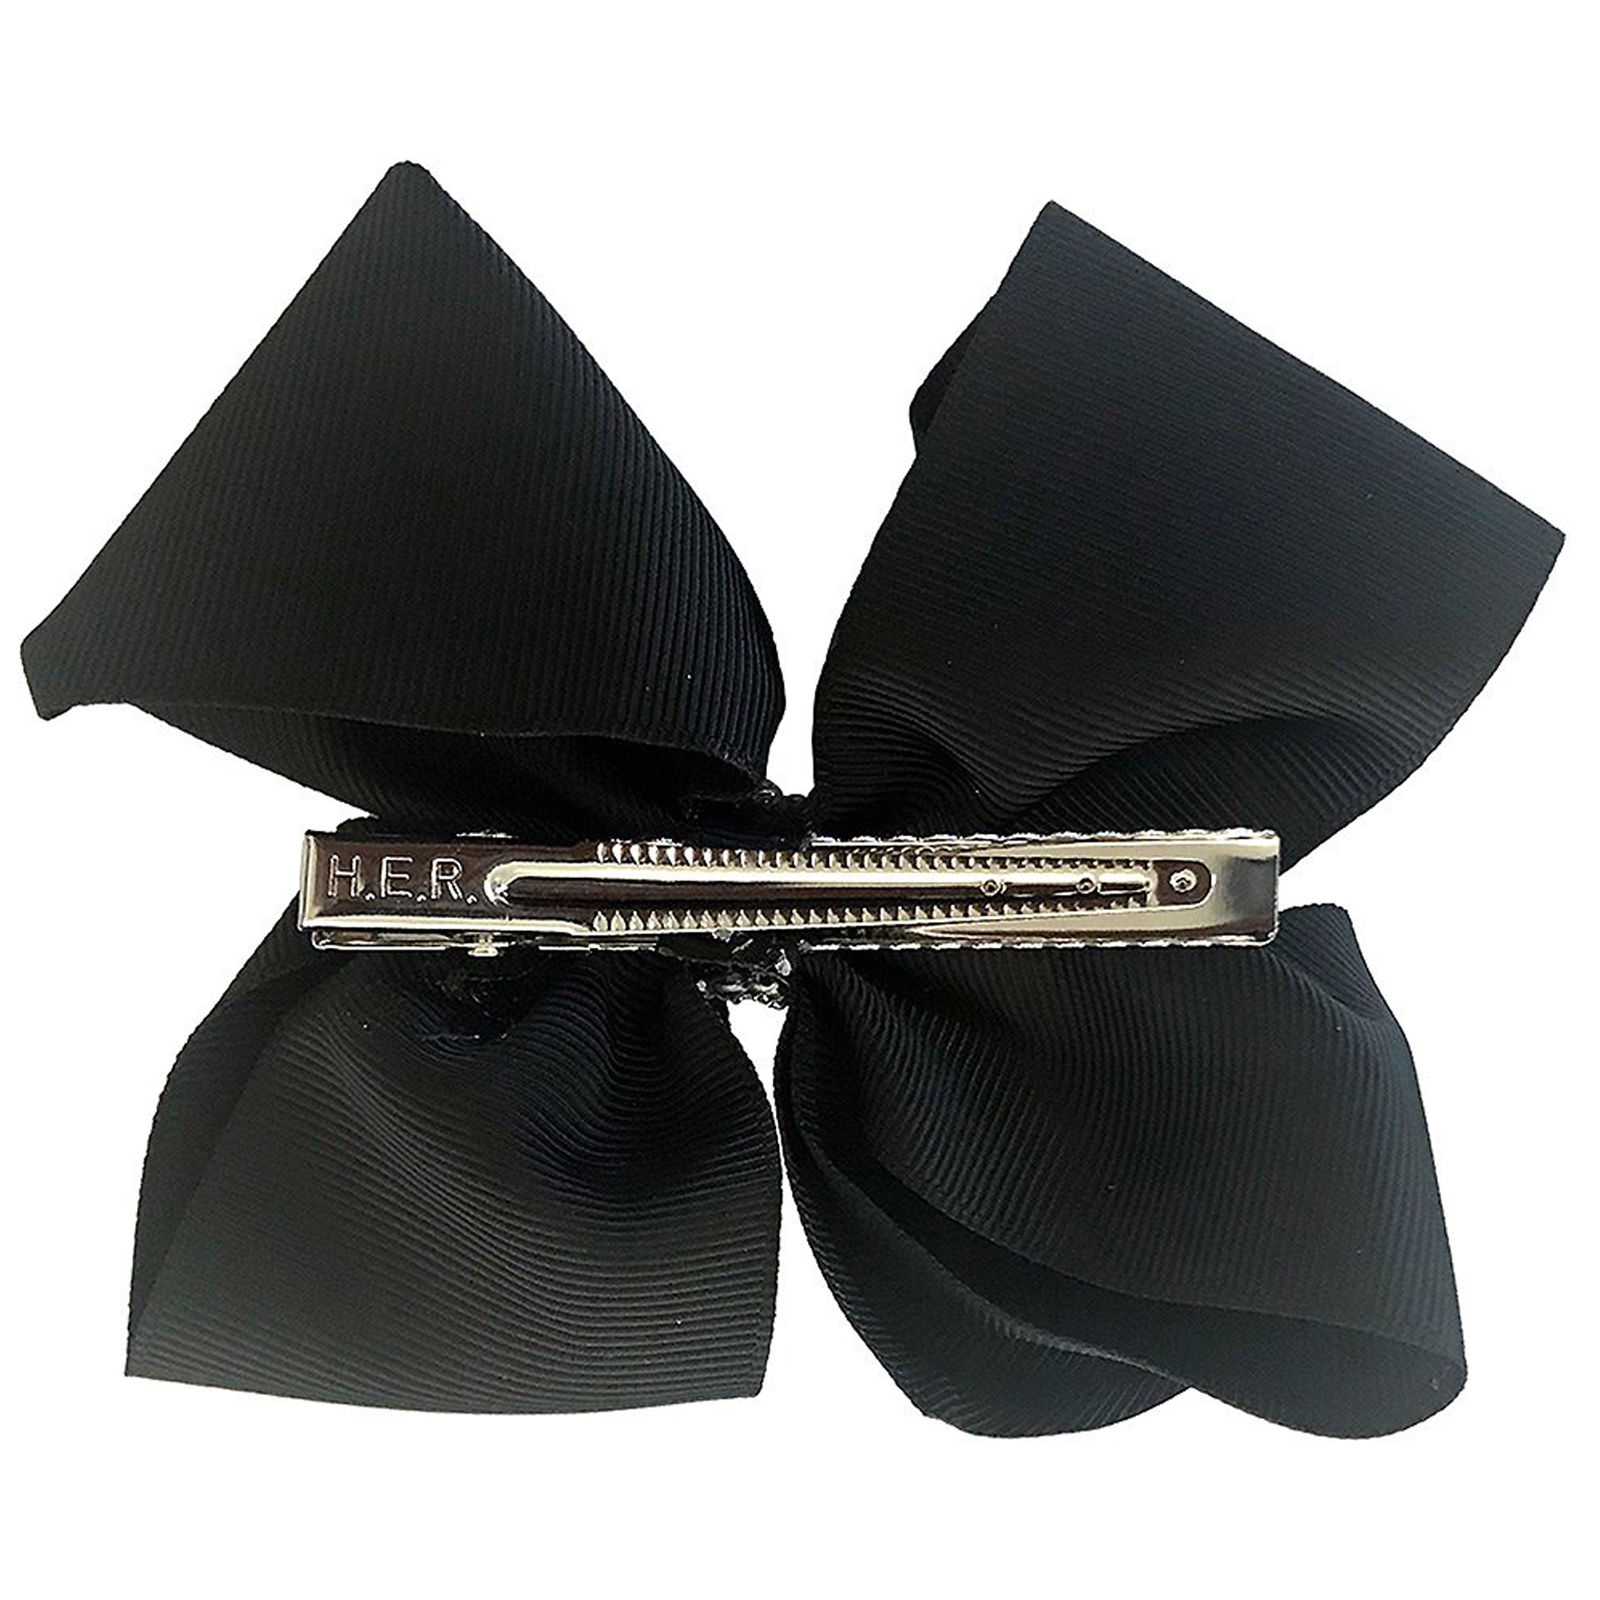 Nickelodeon JoJo Siwa Girls Hair Clip Style Bow Black with Rhinestones Accessory